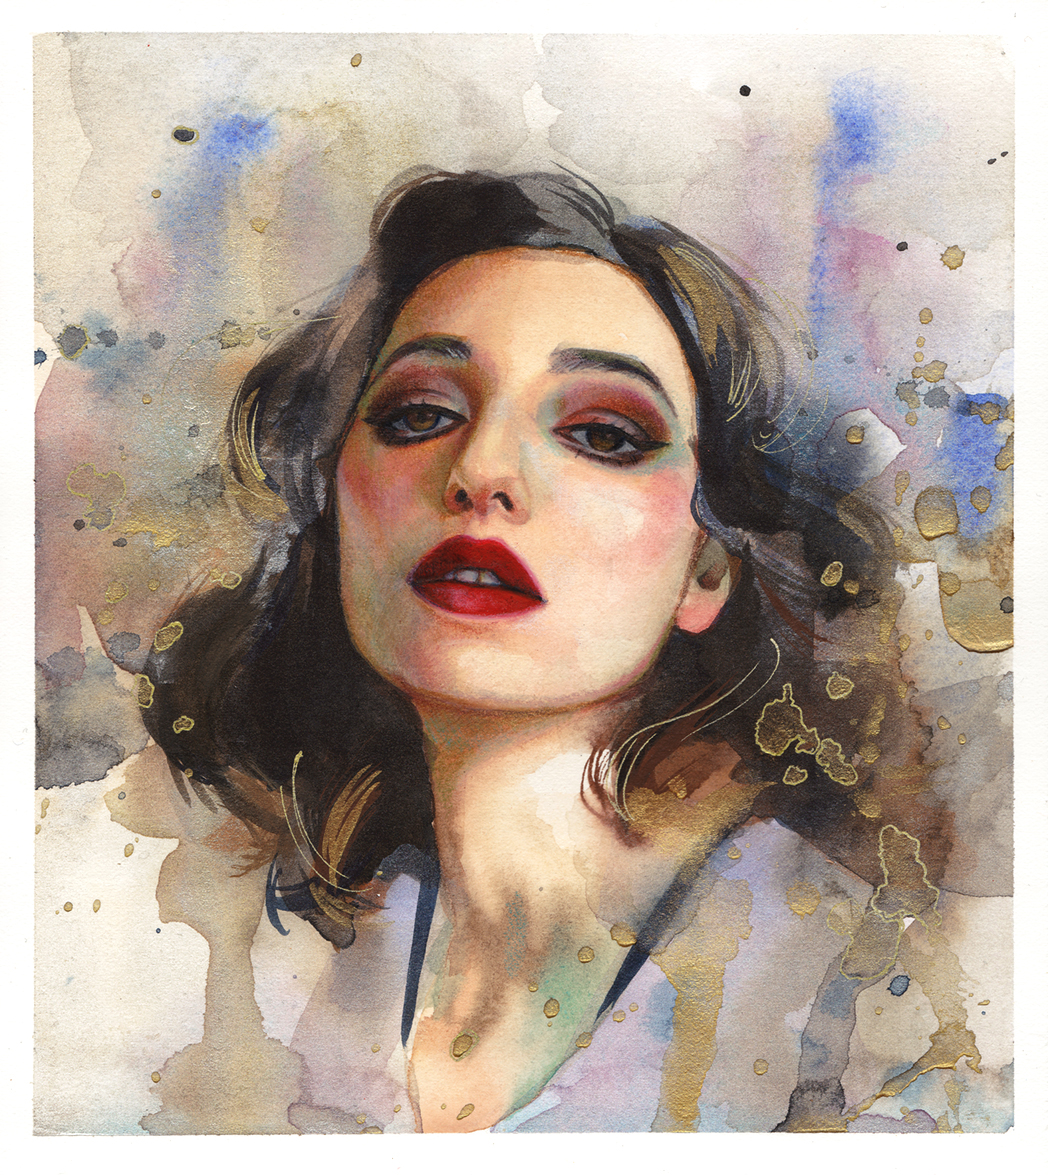 Selfportrait - 17x18.5 cm - color corrected.jpg